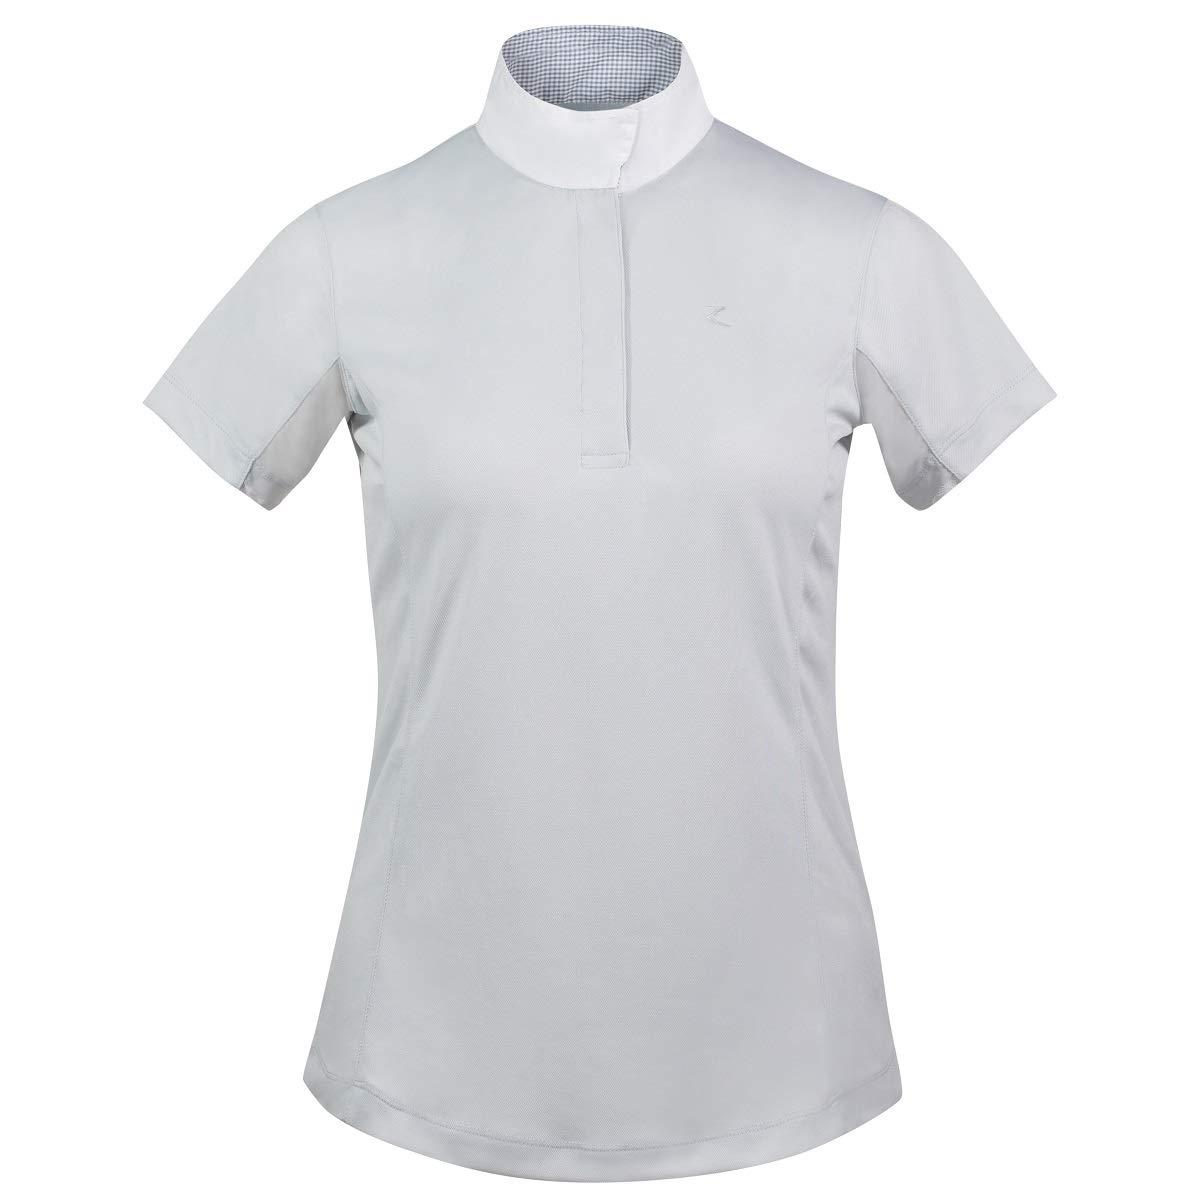 Finn-Tack Horze Blaire ポーラーグレー レディース 機能的 半袖 襟付きショーシャツ (US 12/EU 42)   B07MTQCPXD